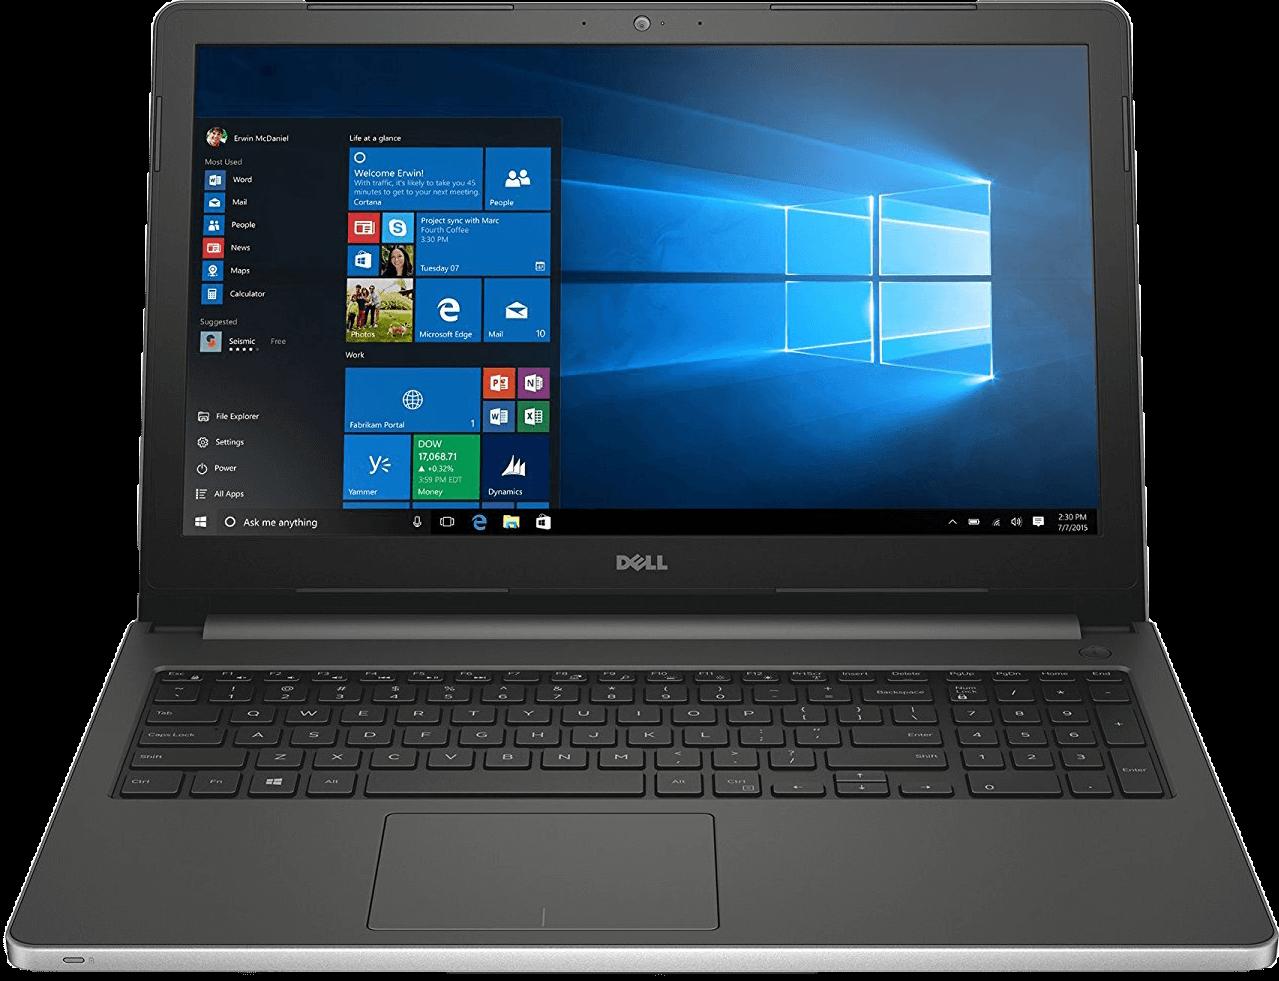 rent laptop rent laptop - Dell - rent Laptop